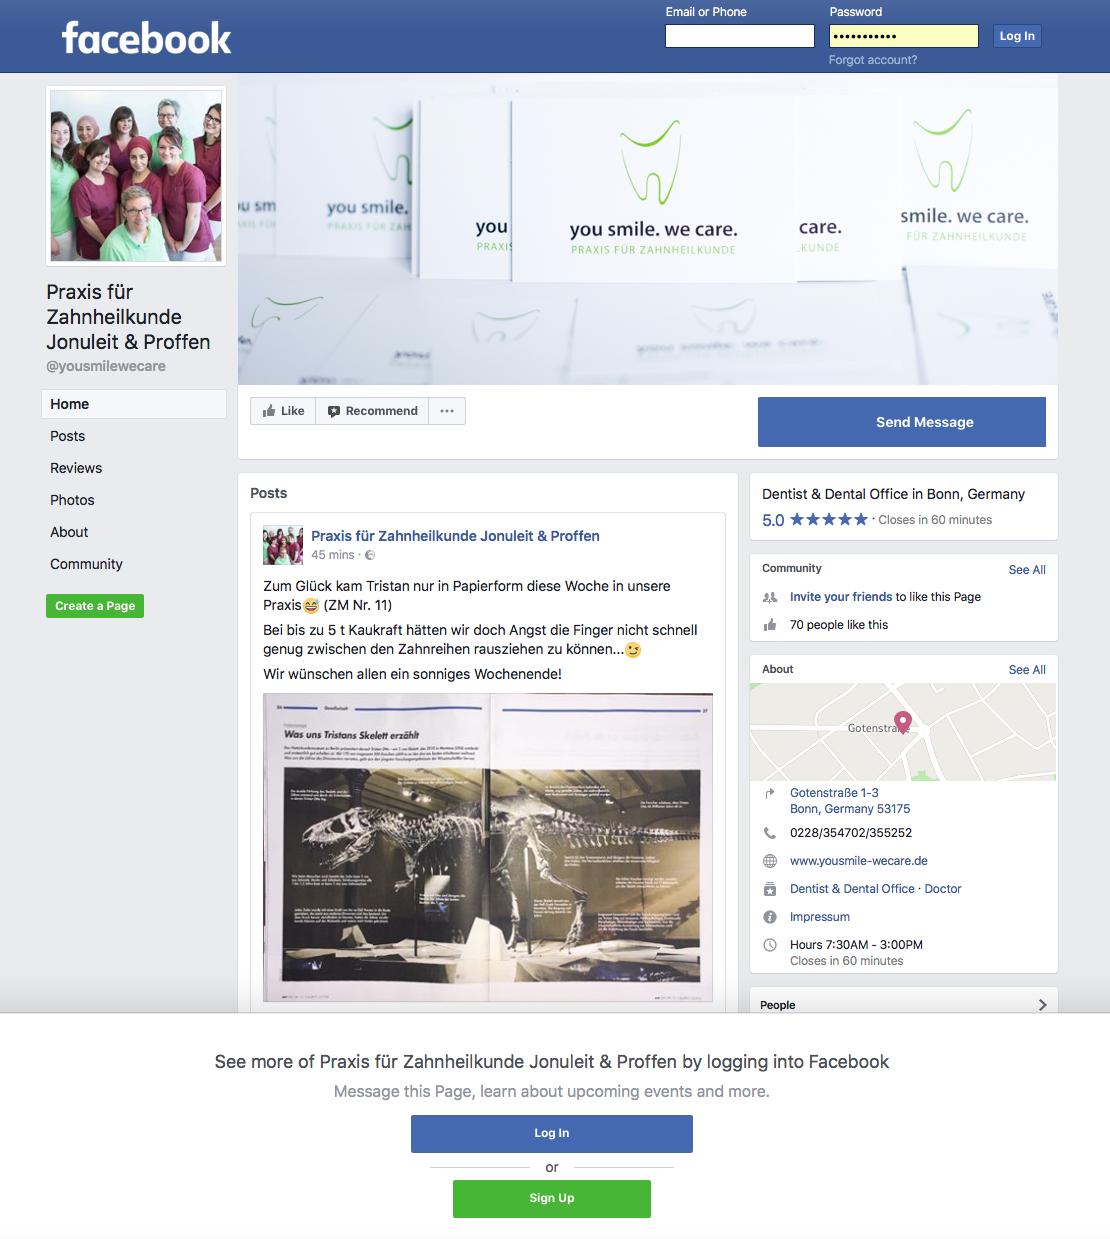 Praxis facebook page